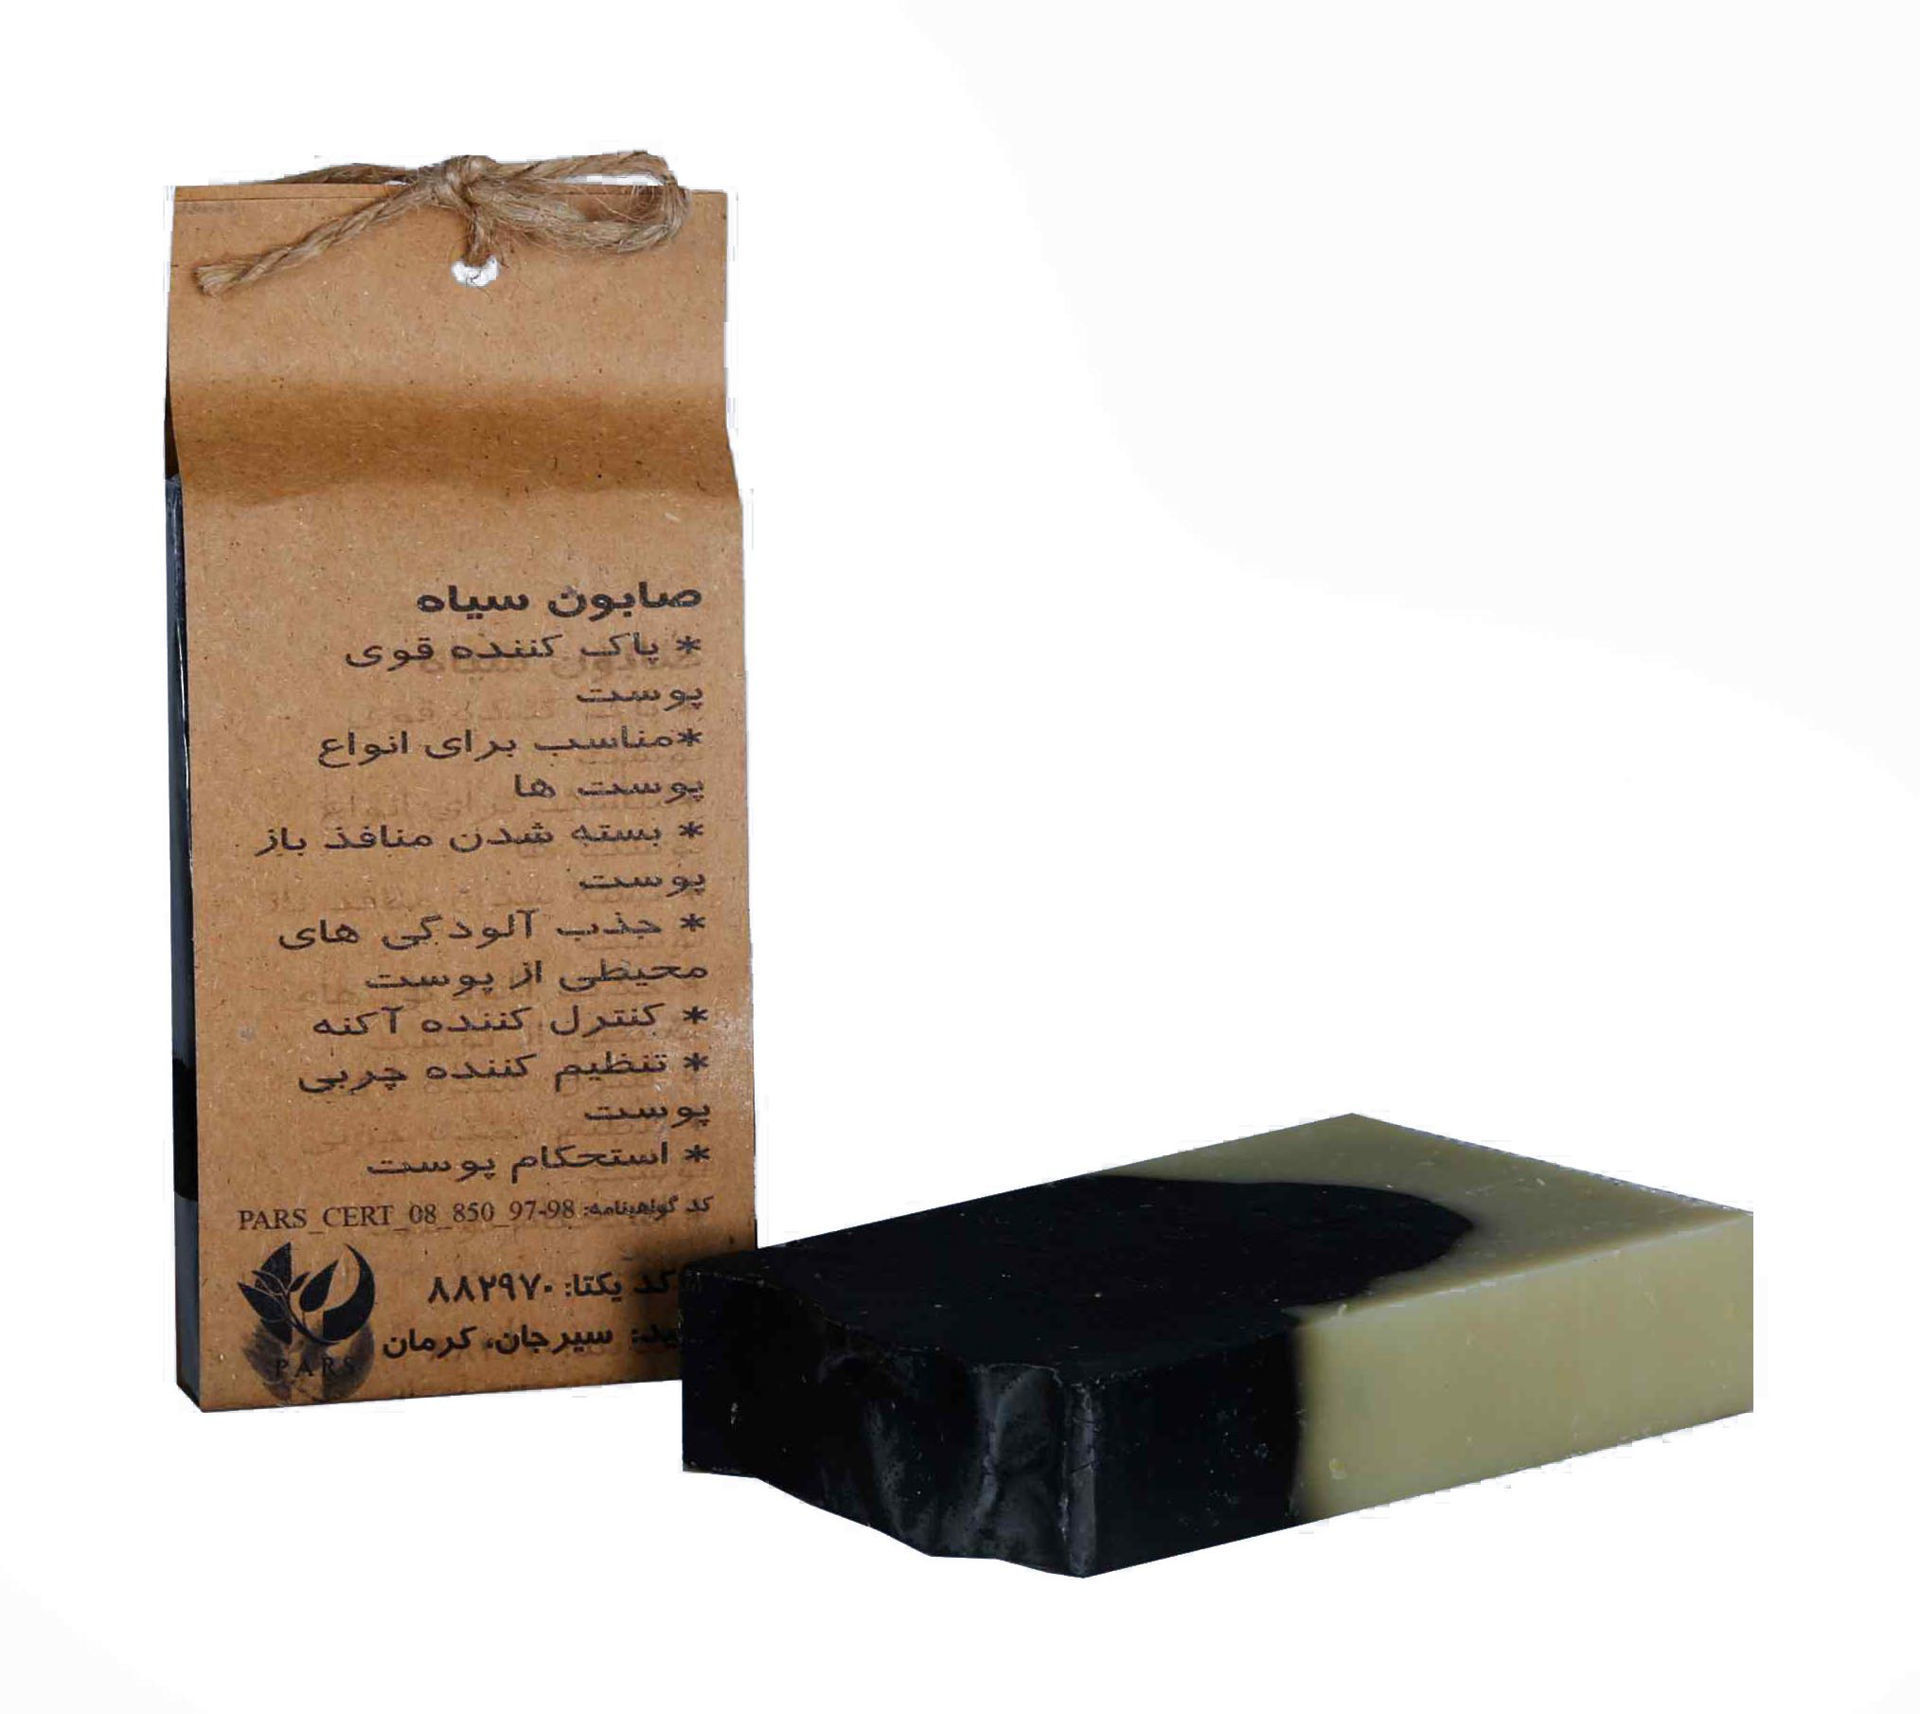 صابون گیاهی ارگانیک ذغال سیاه